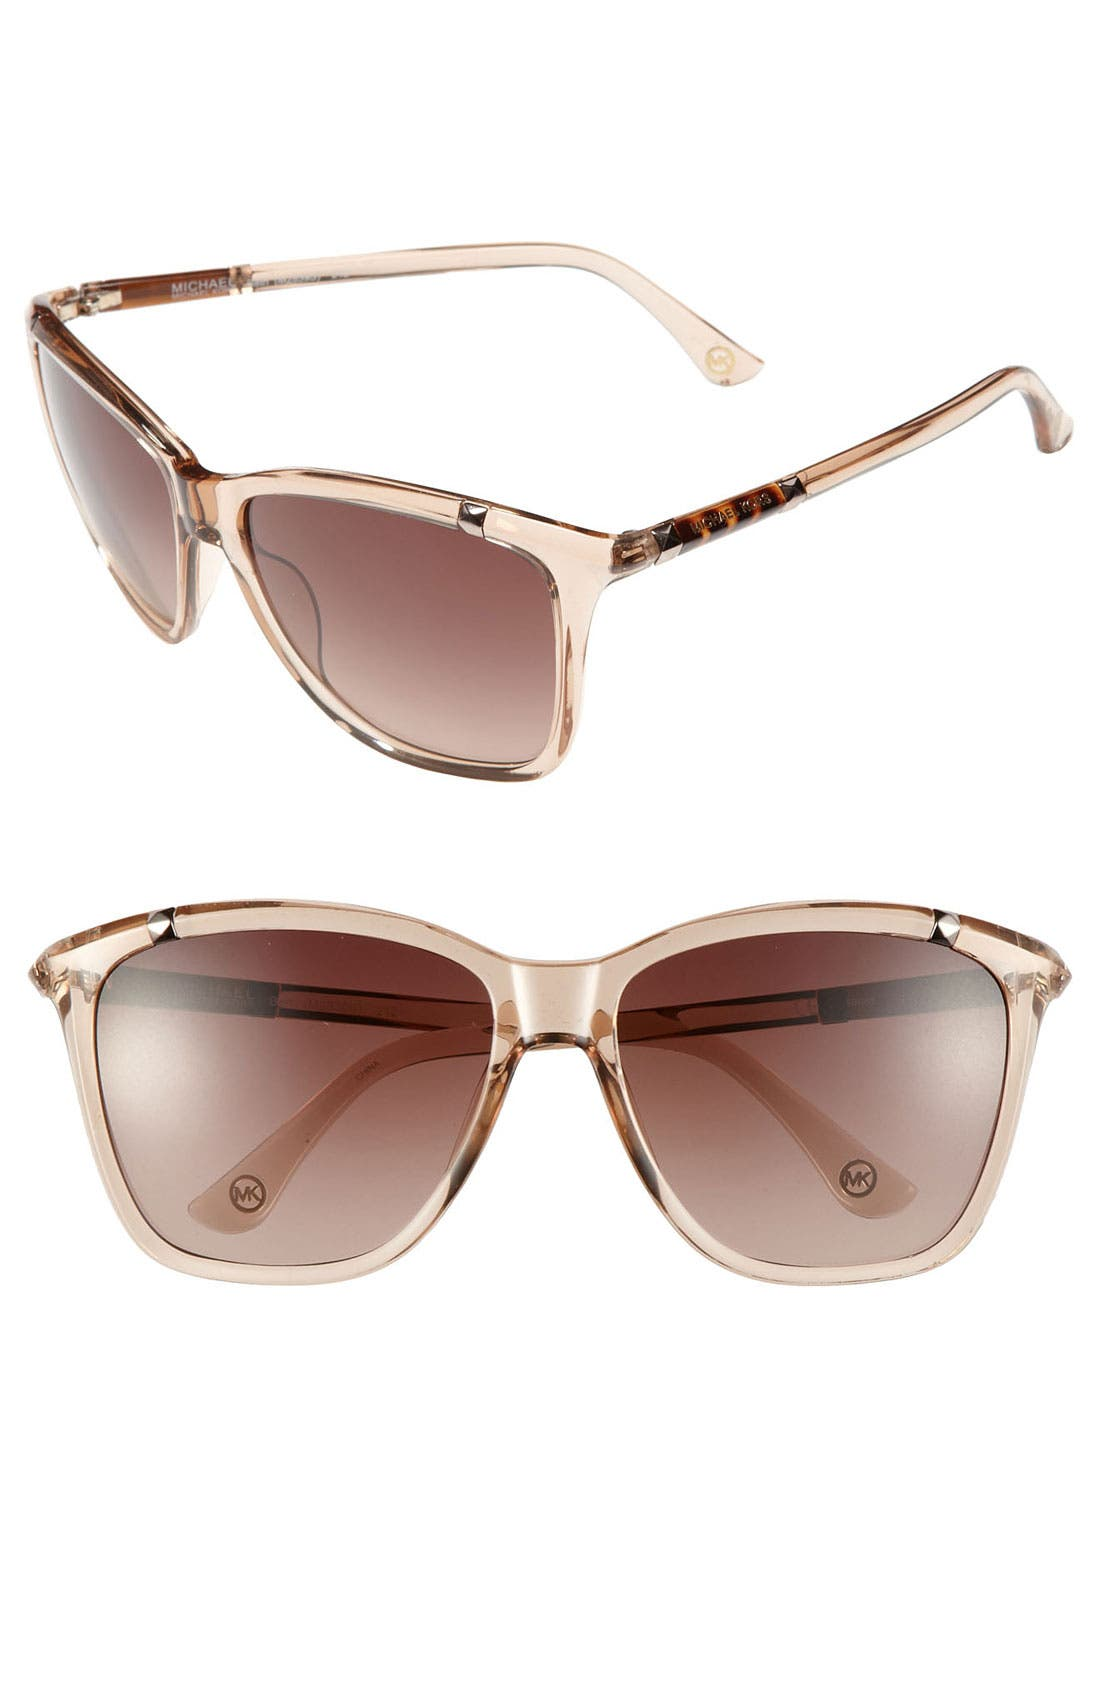 Alternate Image 1 Selected - MICHAEL Michael Kors 'Beth' 58mm Sunglasses